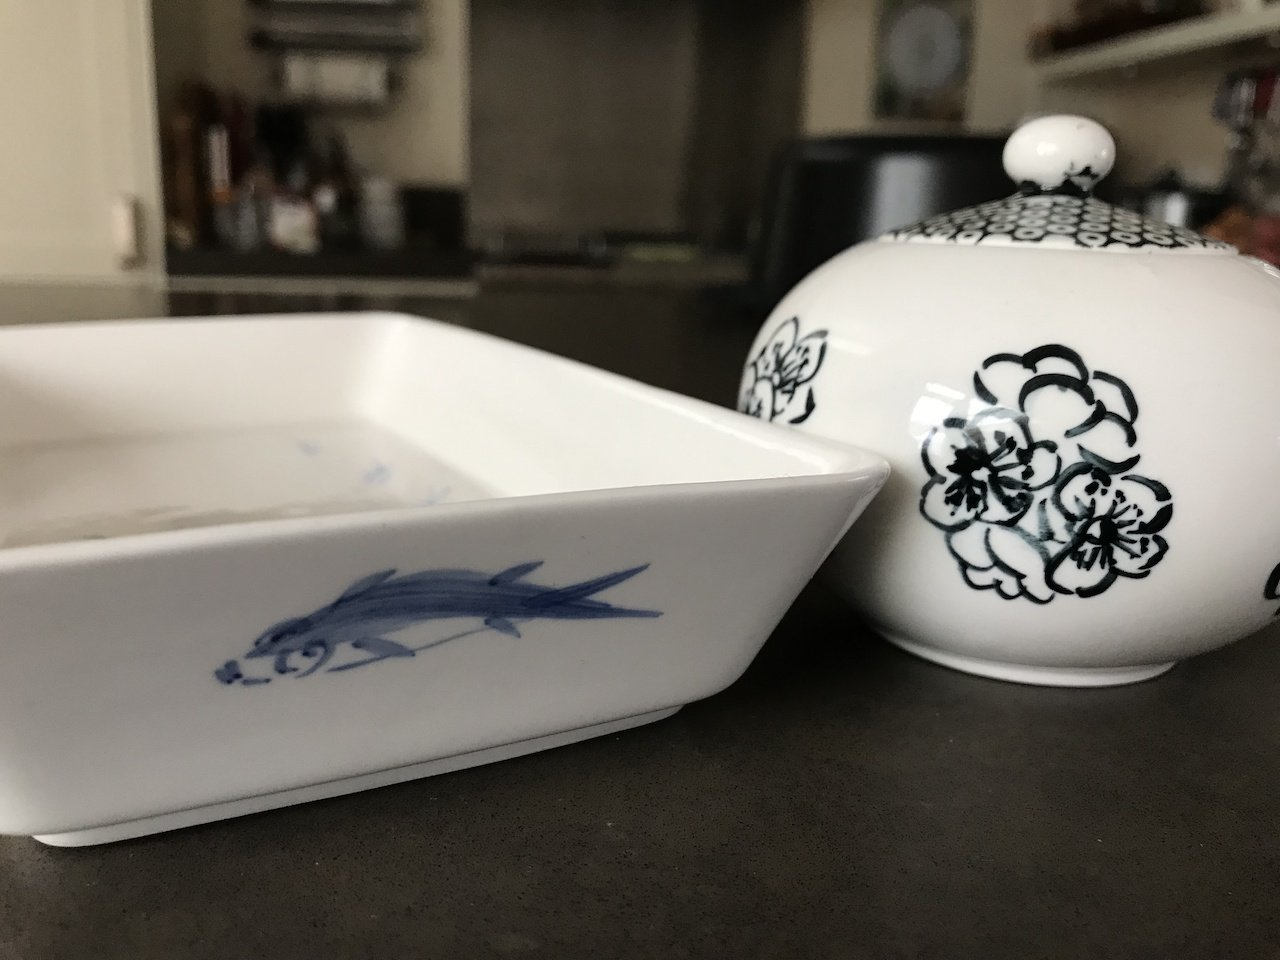 Mijn werk gedecoreerde werk op Chinees porselein